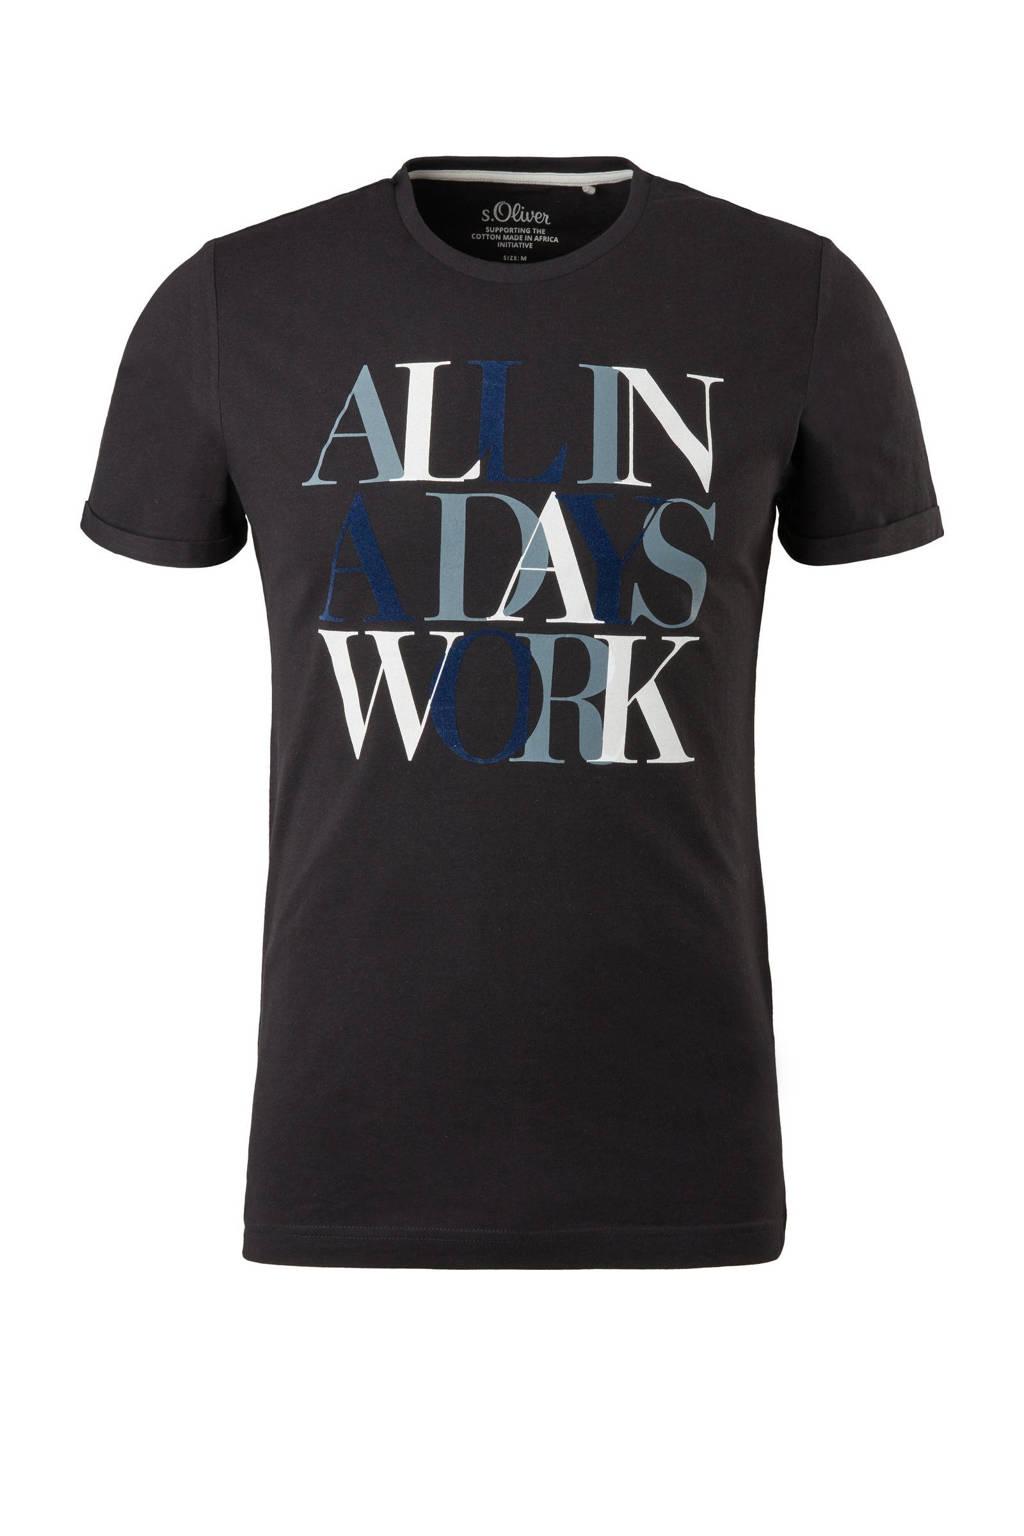 s.Oliver T-shirt met printopdruk zwart, Zwart